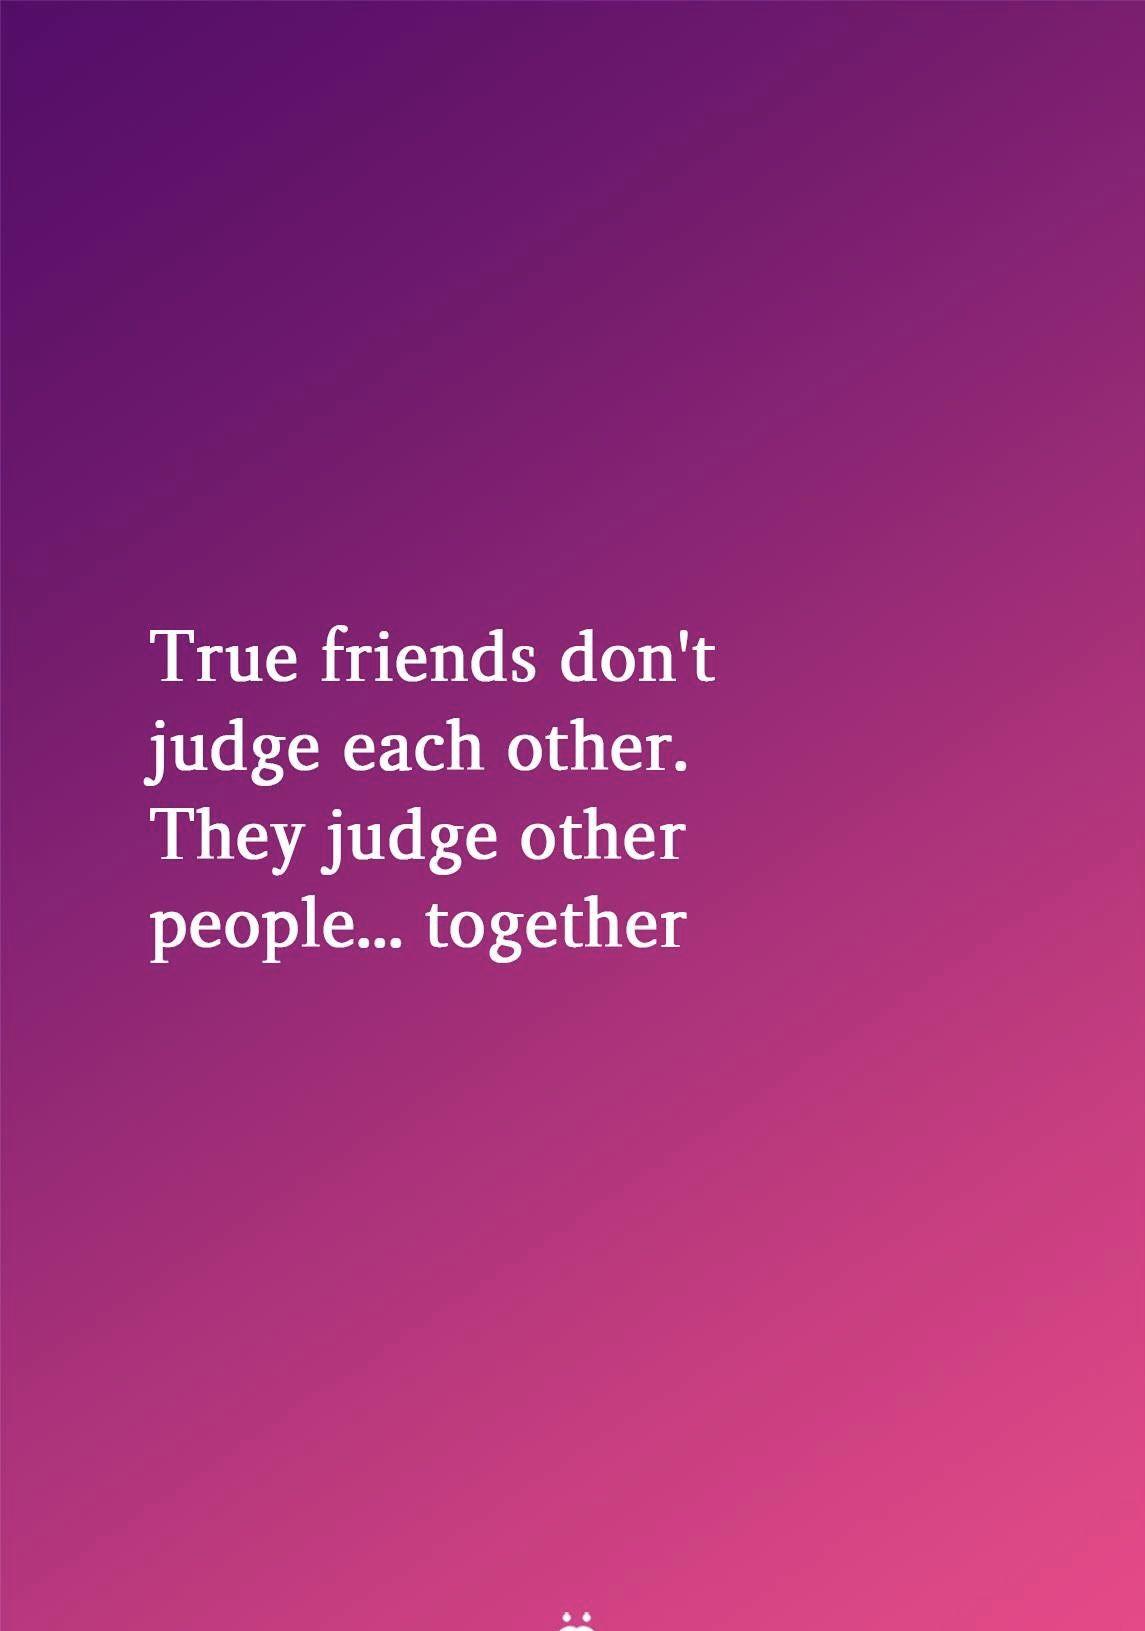 Pin By Manisha K On Relationship Trust Love Life Quotes Love Life Quotes Life Quotes True Friends